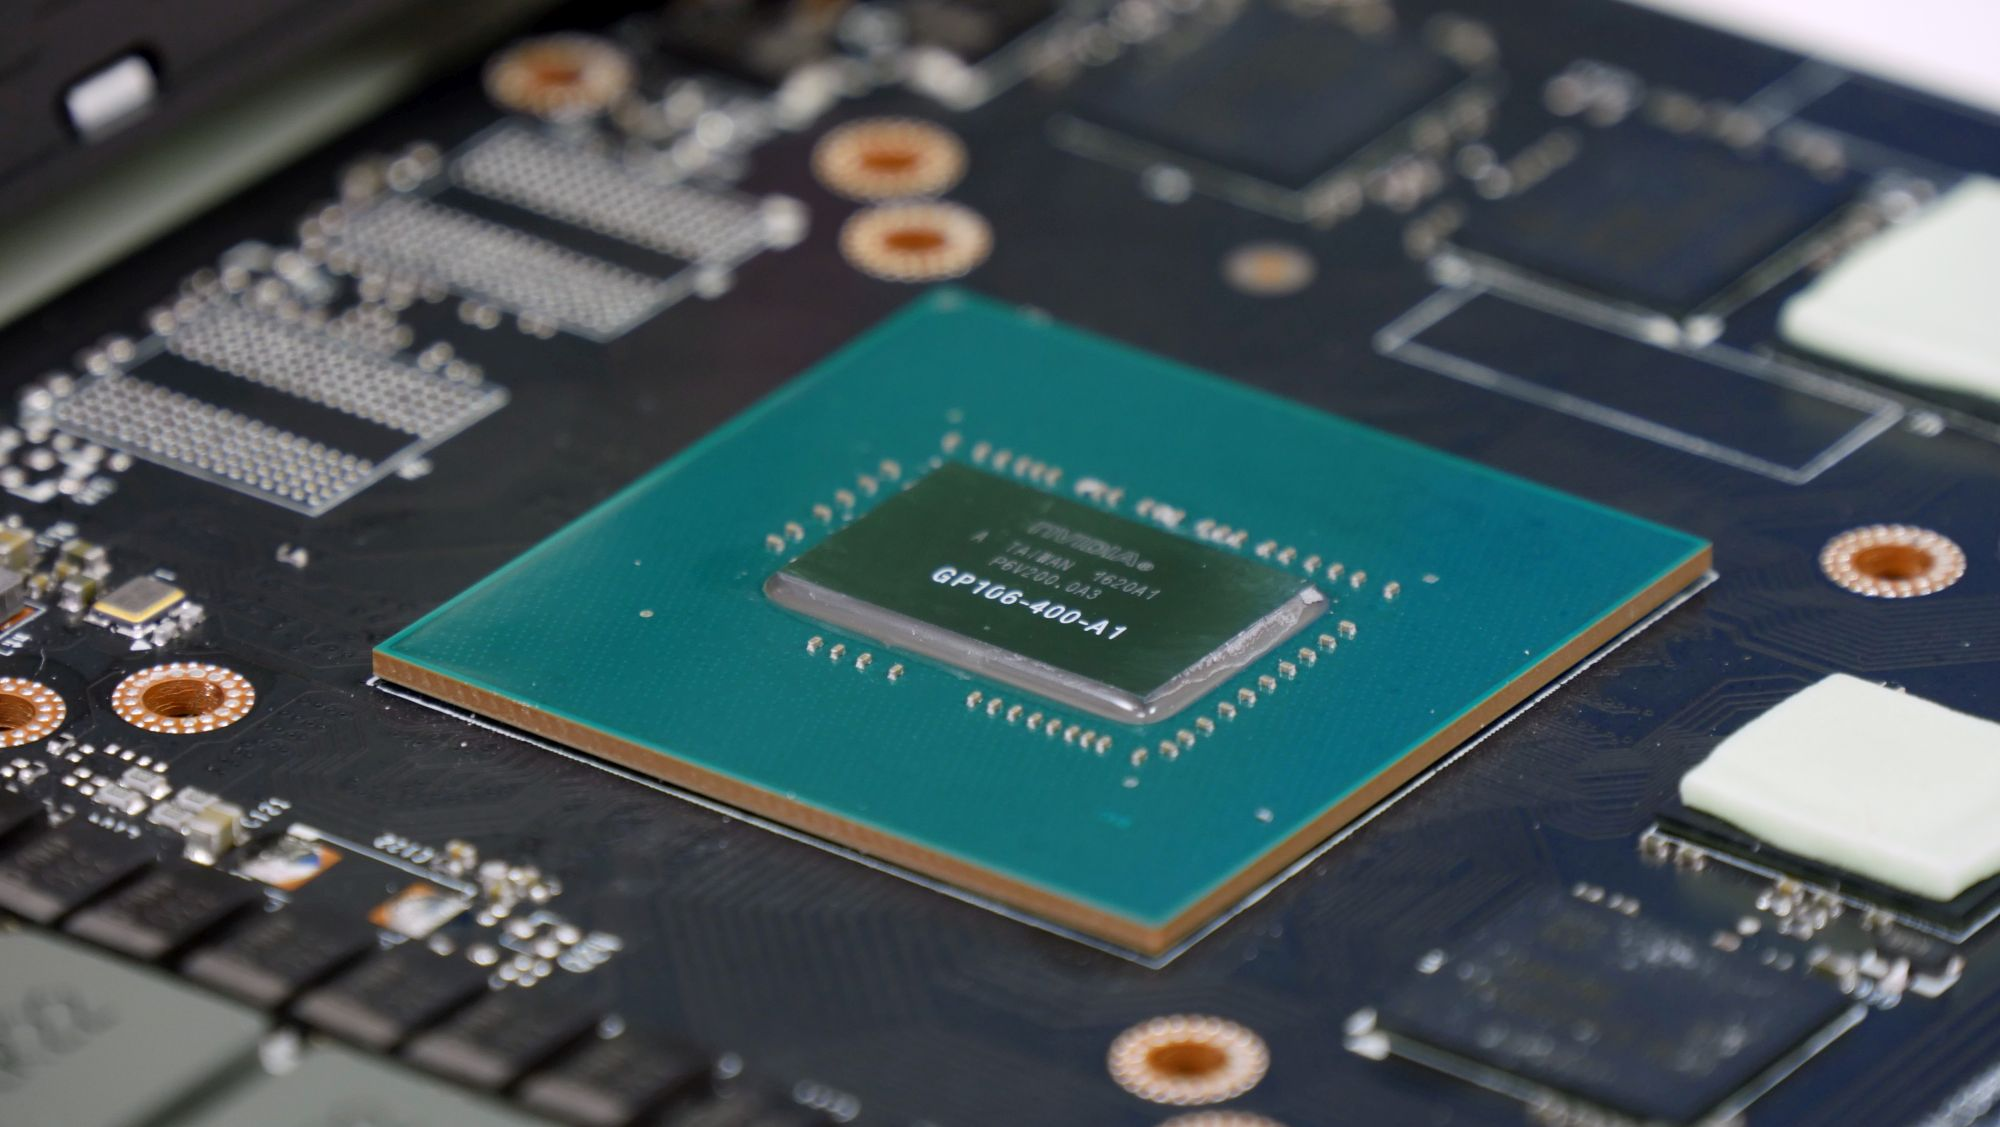 Nvidia_Geforce_GTX_1060_005